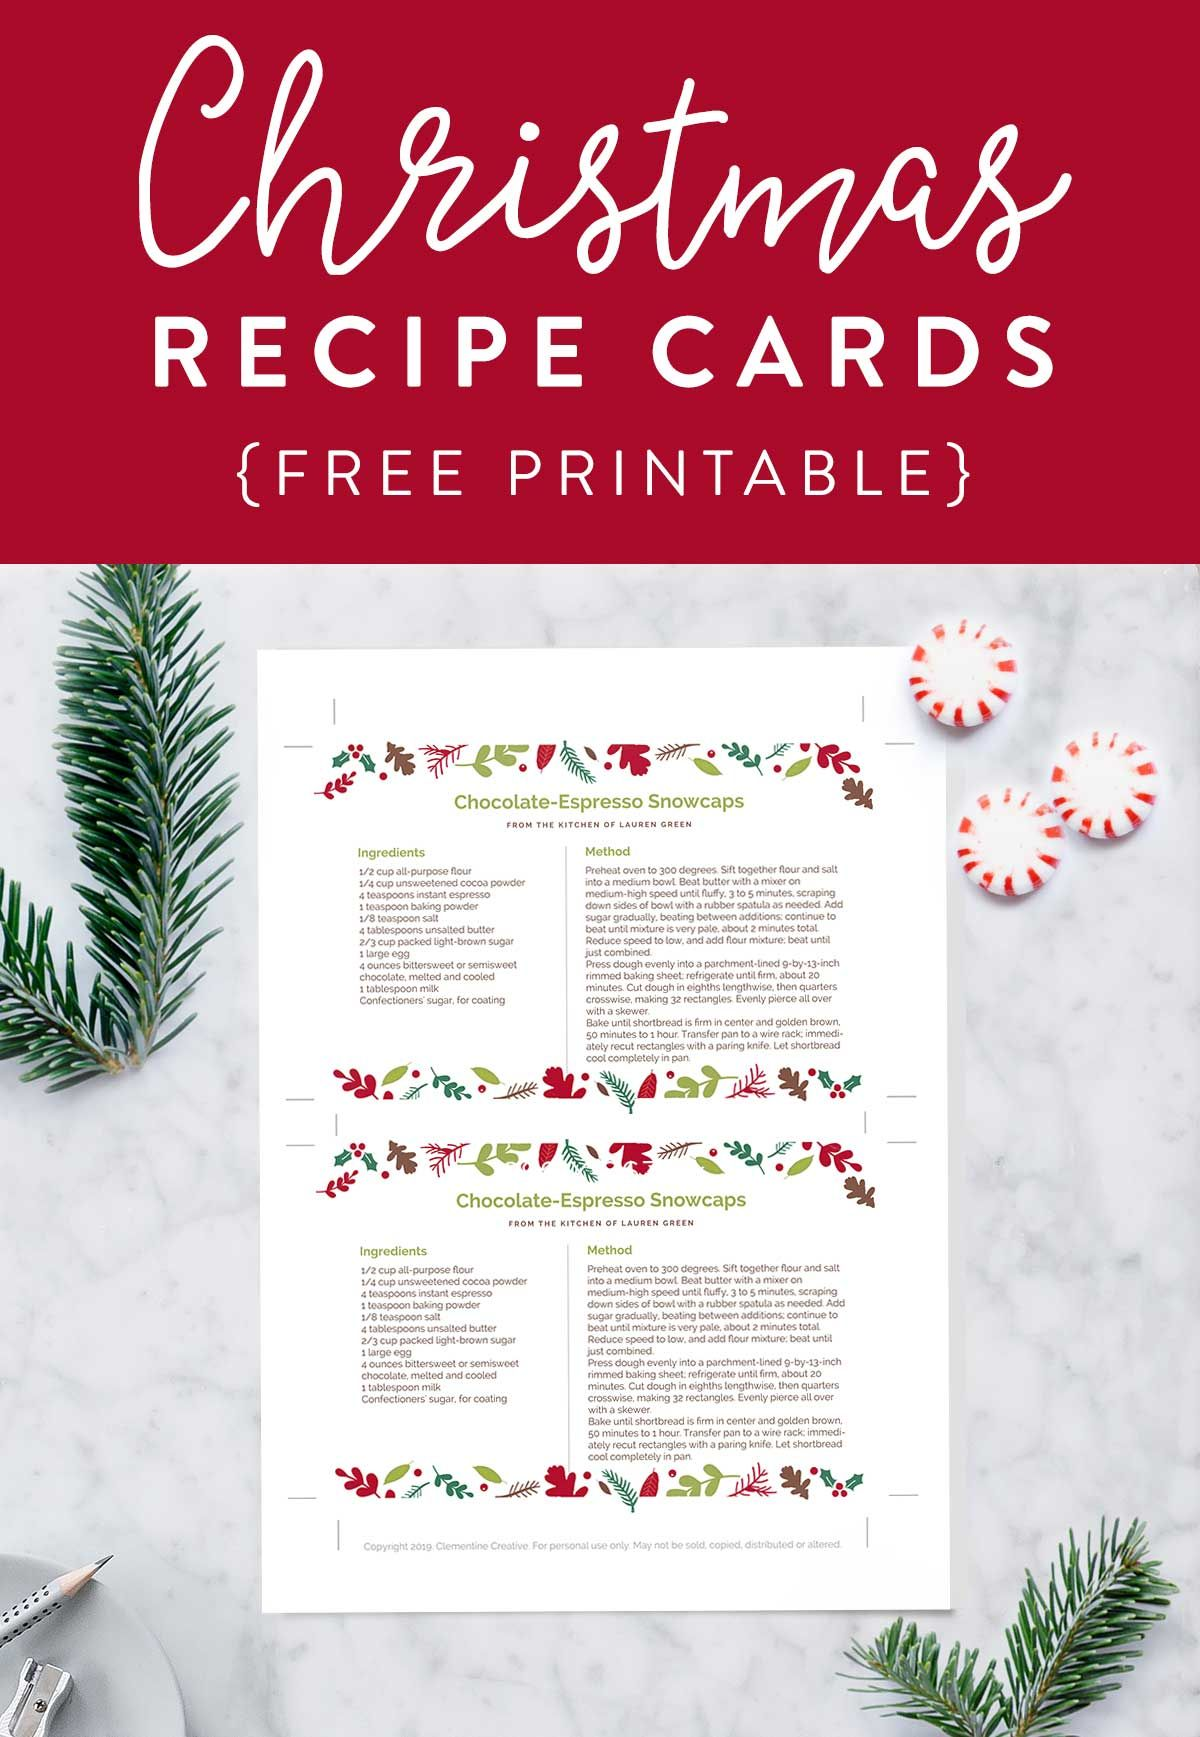 Printable Christmas Recipe Card Editable Pdf Template Clementine Creative Christmas Recipe Cards Printable Christmas Recipe Cards Recipe Cards Template